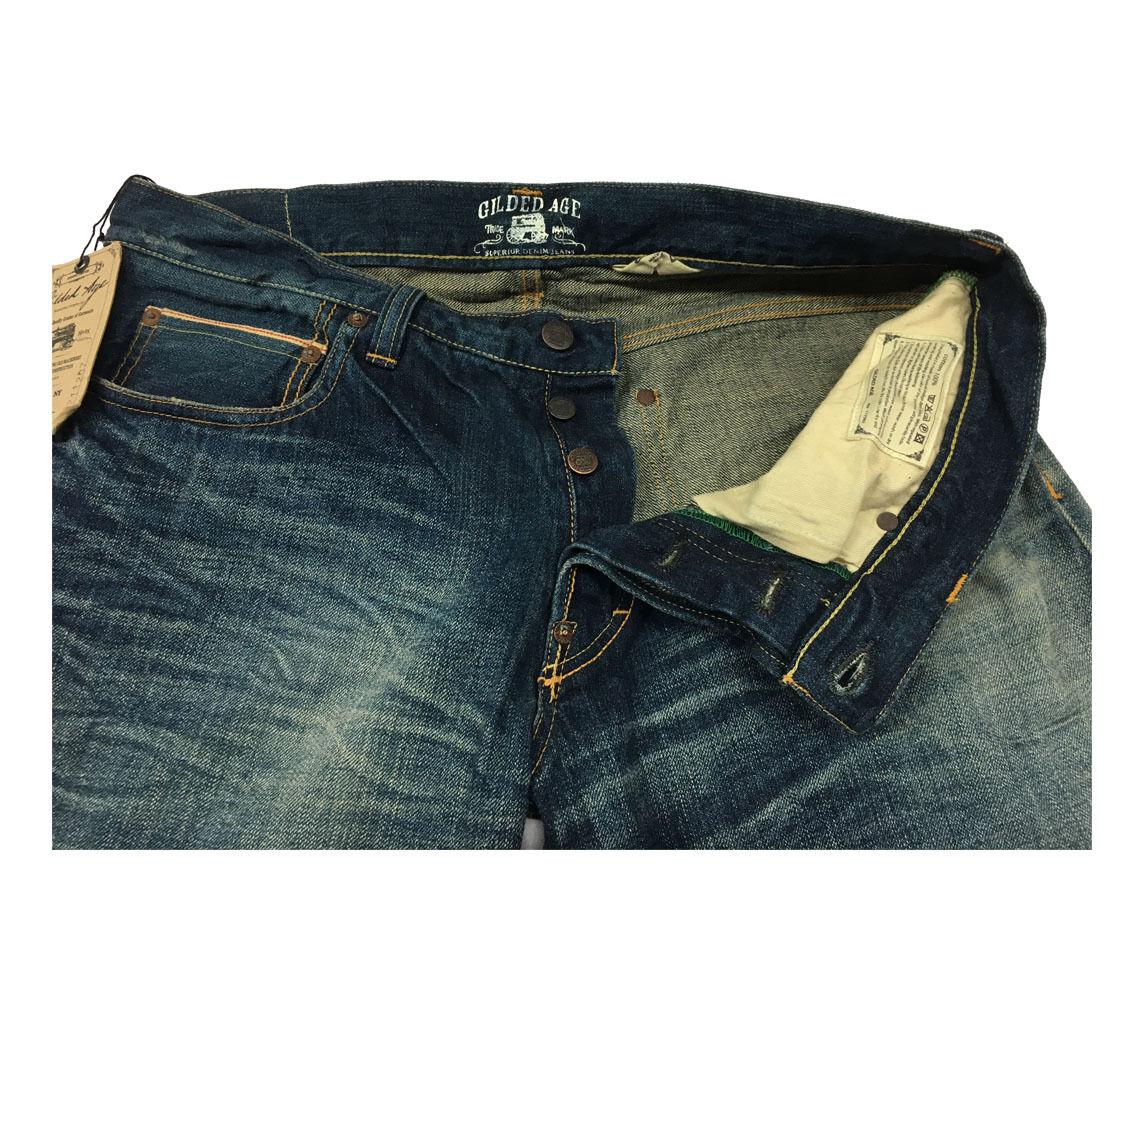 GILDED AGE jeans uomo mod GA GA GA 1011-B BAXTEN 100% cotone MADE IN JAPAN d1863f